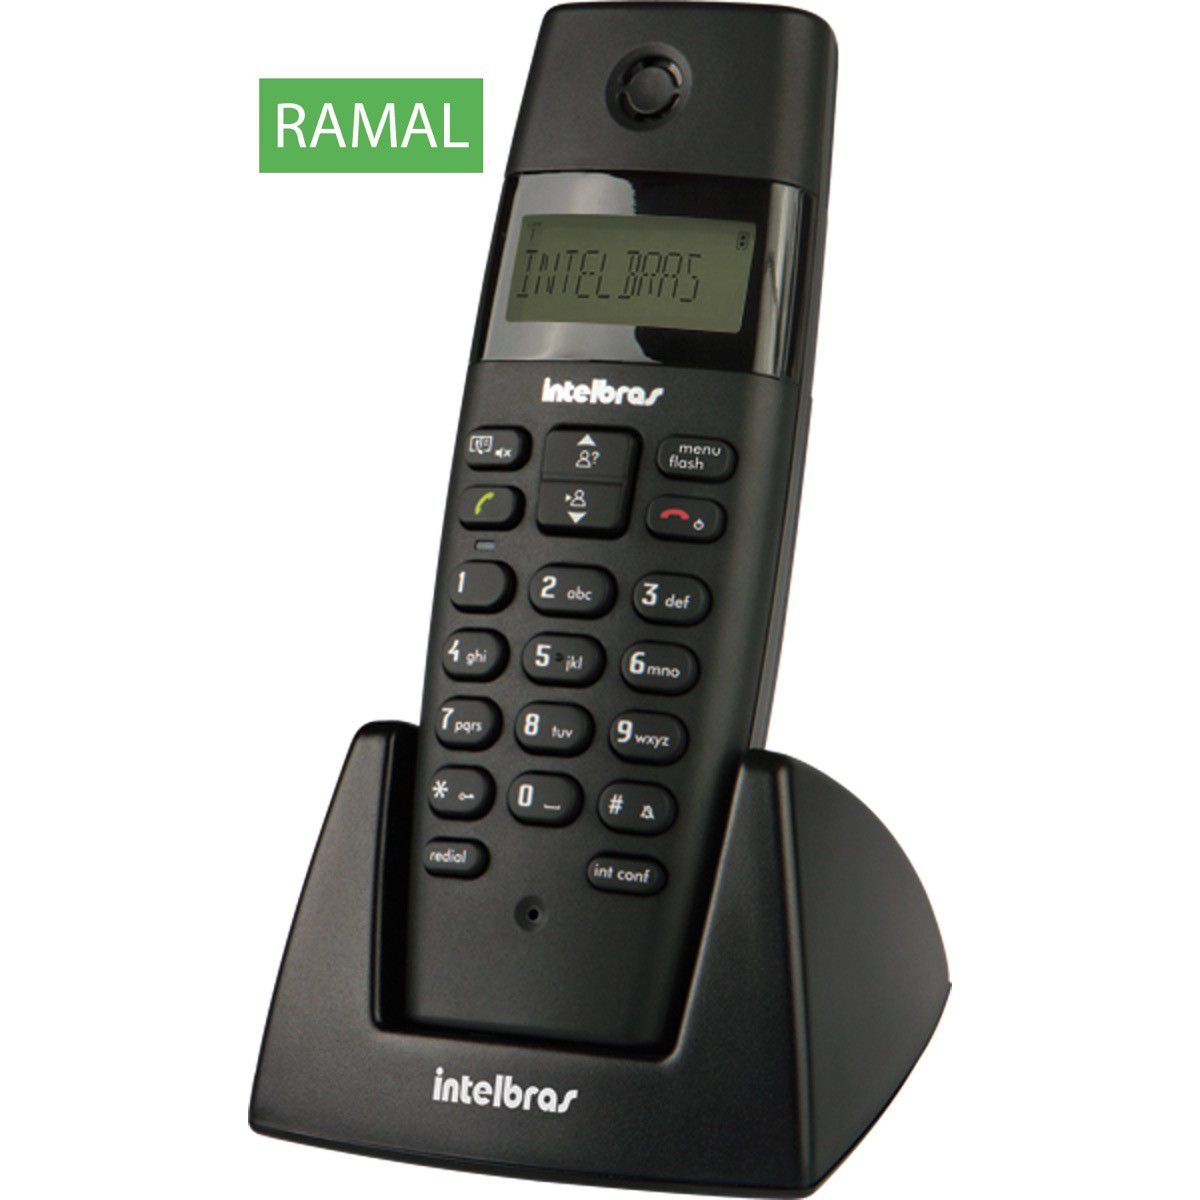 Telefone Ramal S/Fio Intelbras